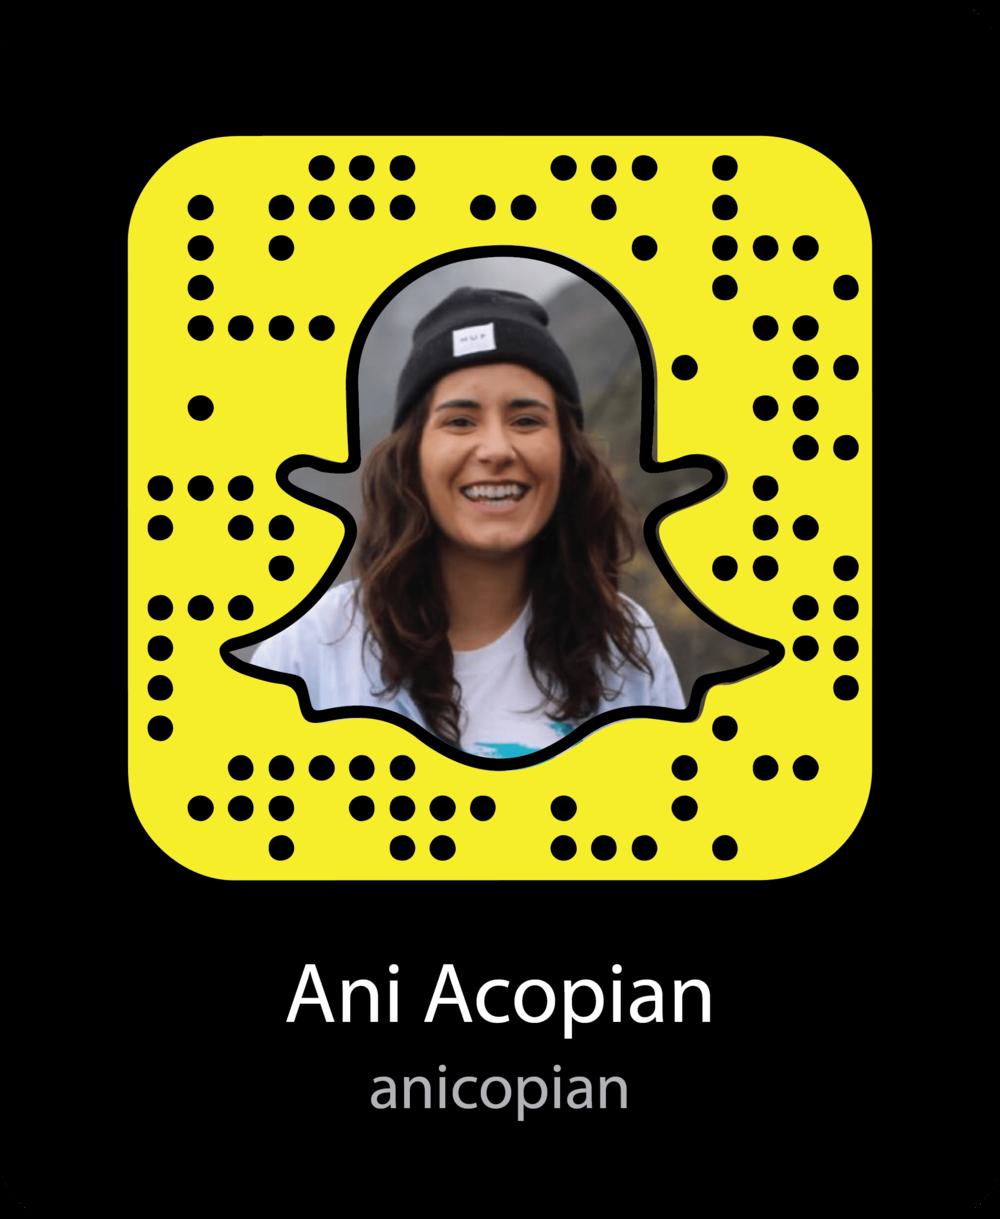 ani-acopian-storytellers-snapchat-snapcode.png